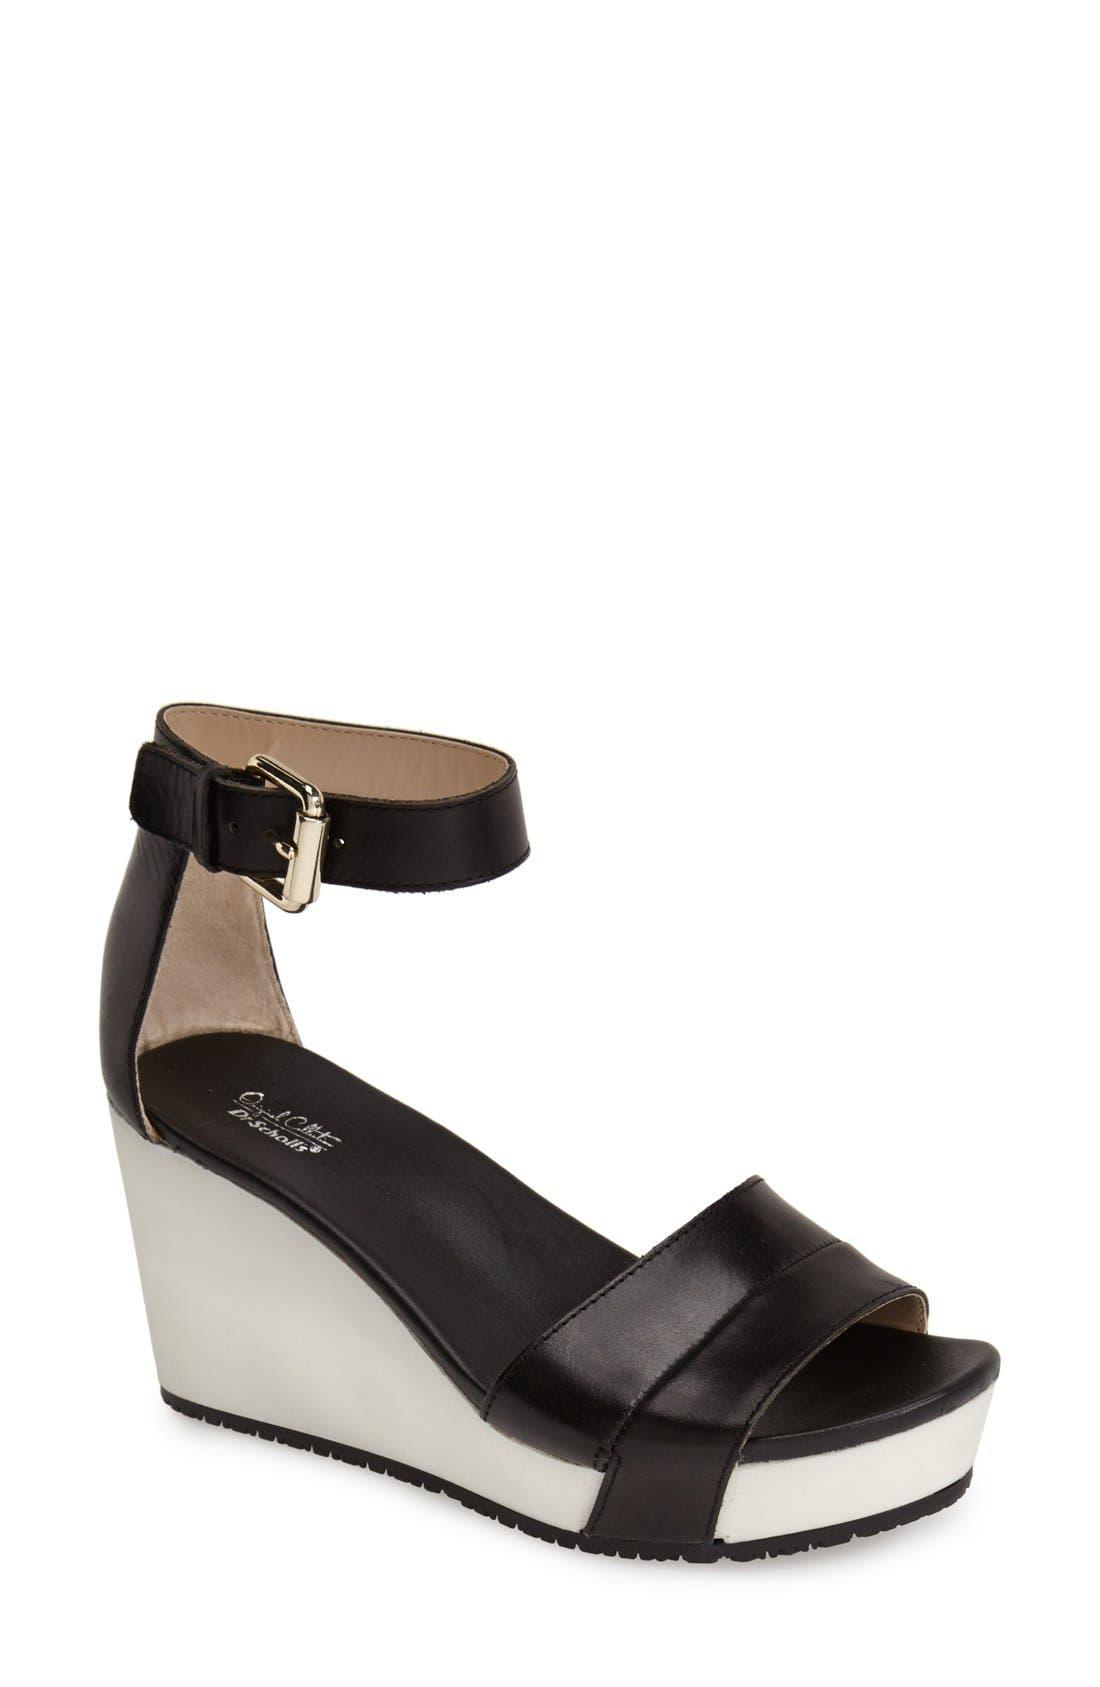 Main Image - Dr. Scholl's Original Collection 'Warner' Wedge Sandal (Women)